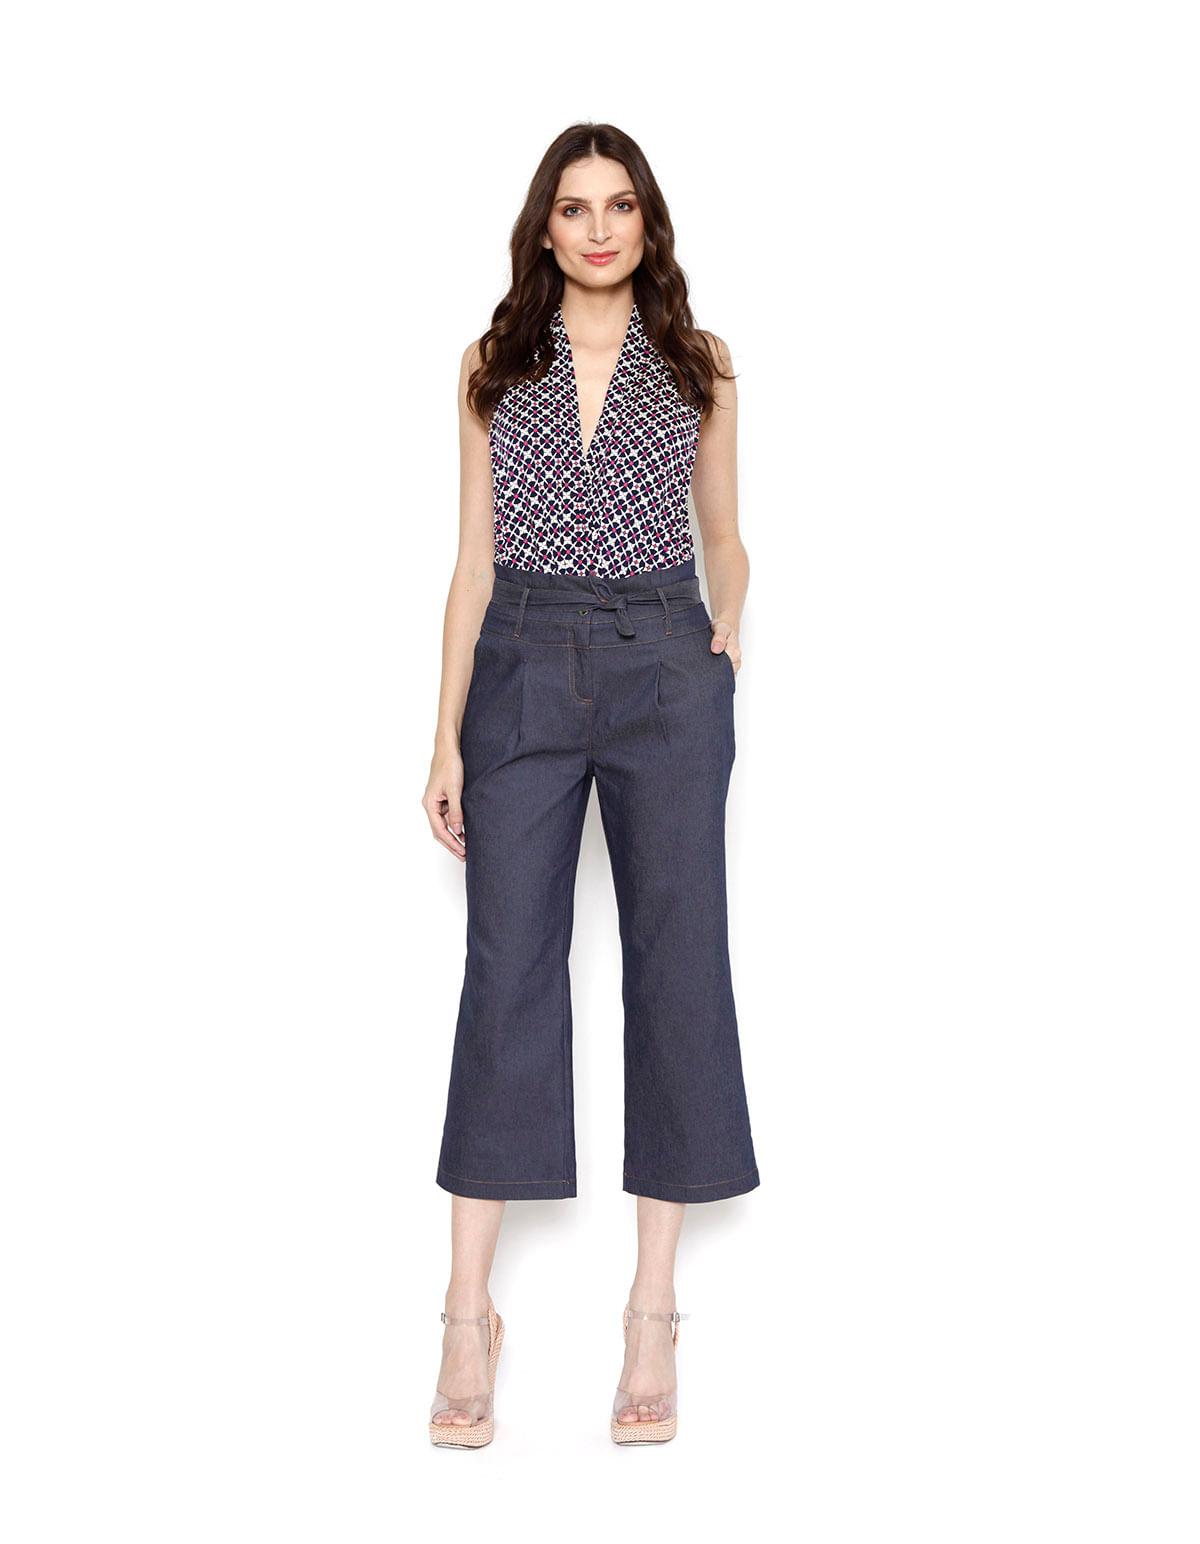 b986856c8 Calca pantacourt clochard jeans azul escuro - LucyintheSky